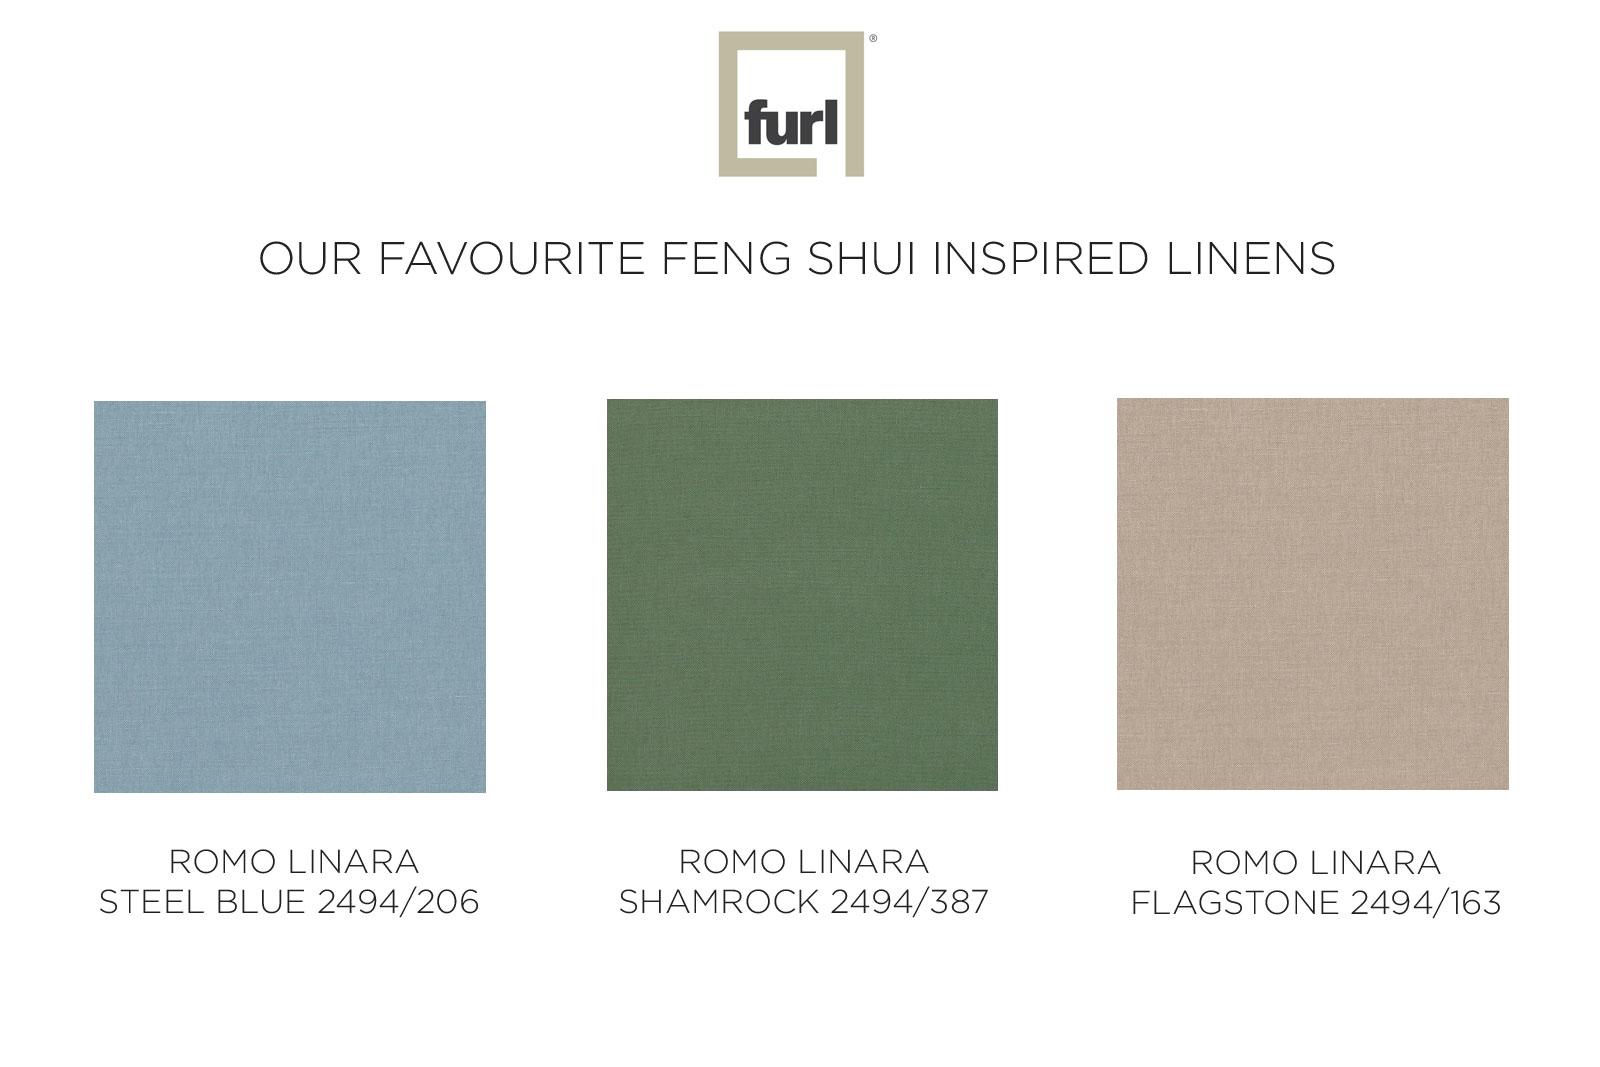 Feng Shui Bedroom Tips For Your Home Furl Blog